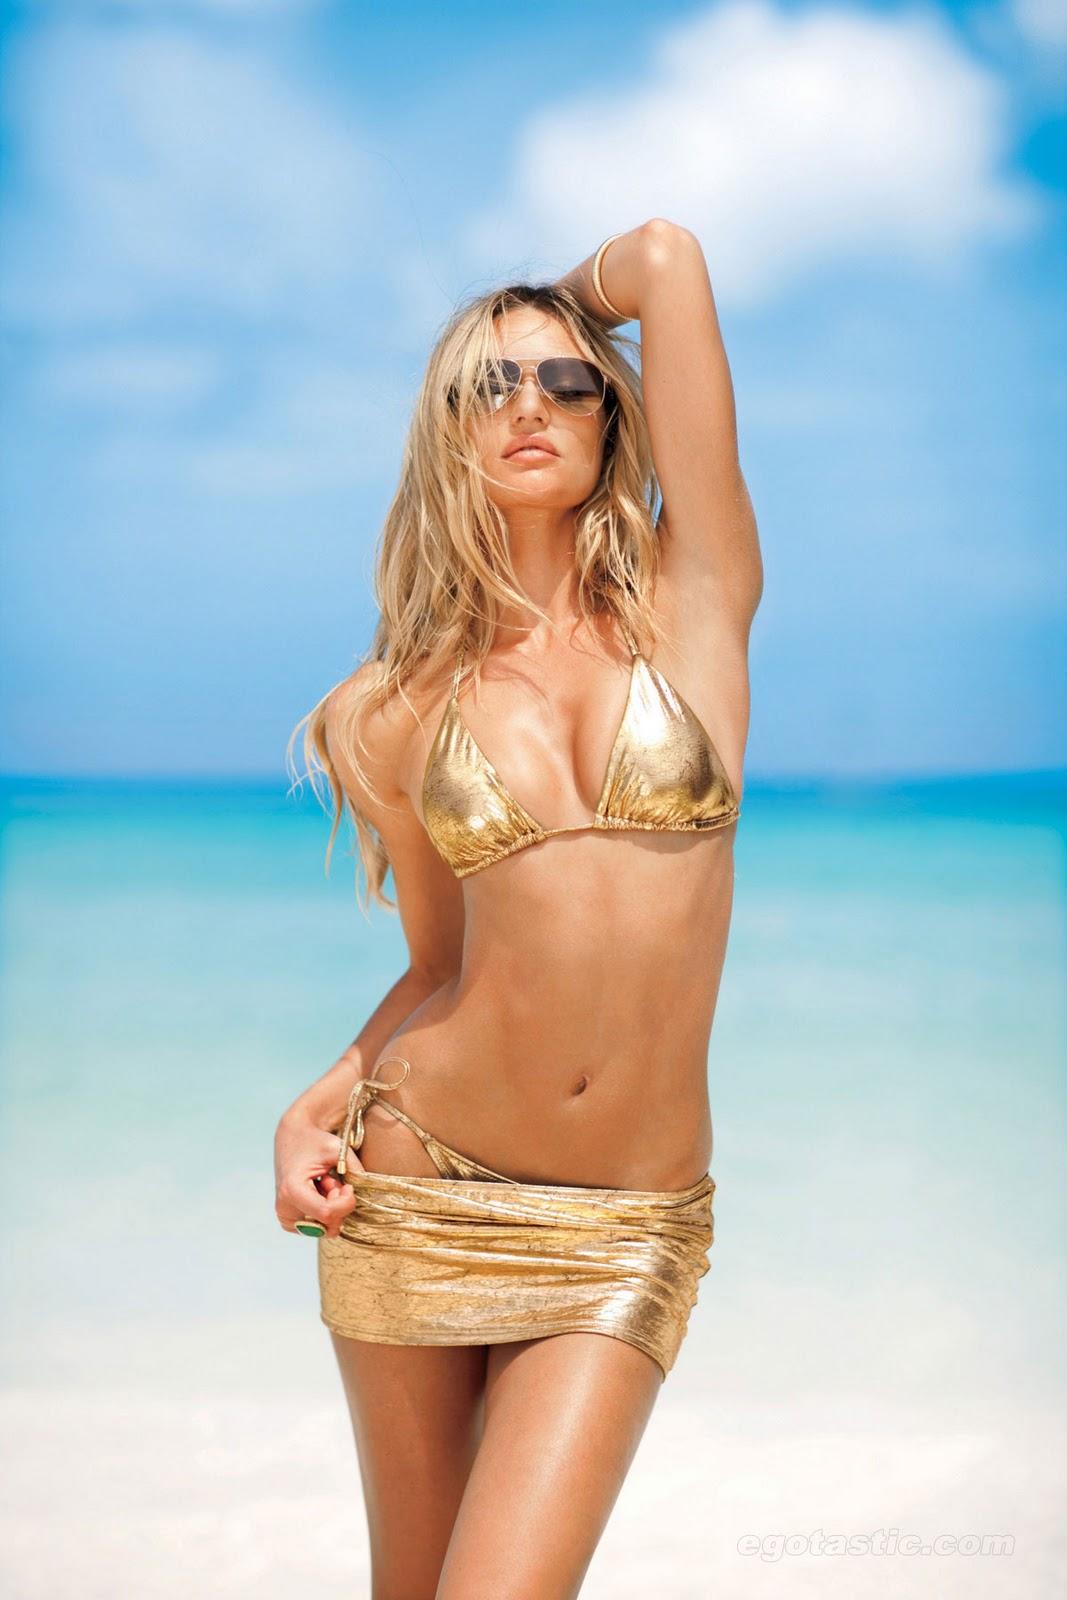 http://2.bp.blogspot.com/_775ESC4svi8/TS39NoCCS7I/AAAAAAAABSw/m1GPJWBBNoM/s1600/candice-swanepoel-victorias-secret-swim-catalog-01.jpg